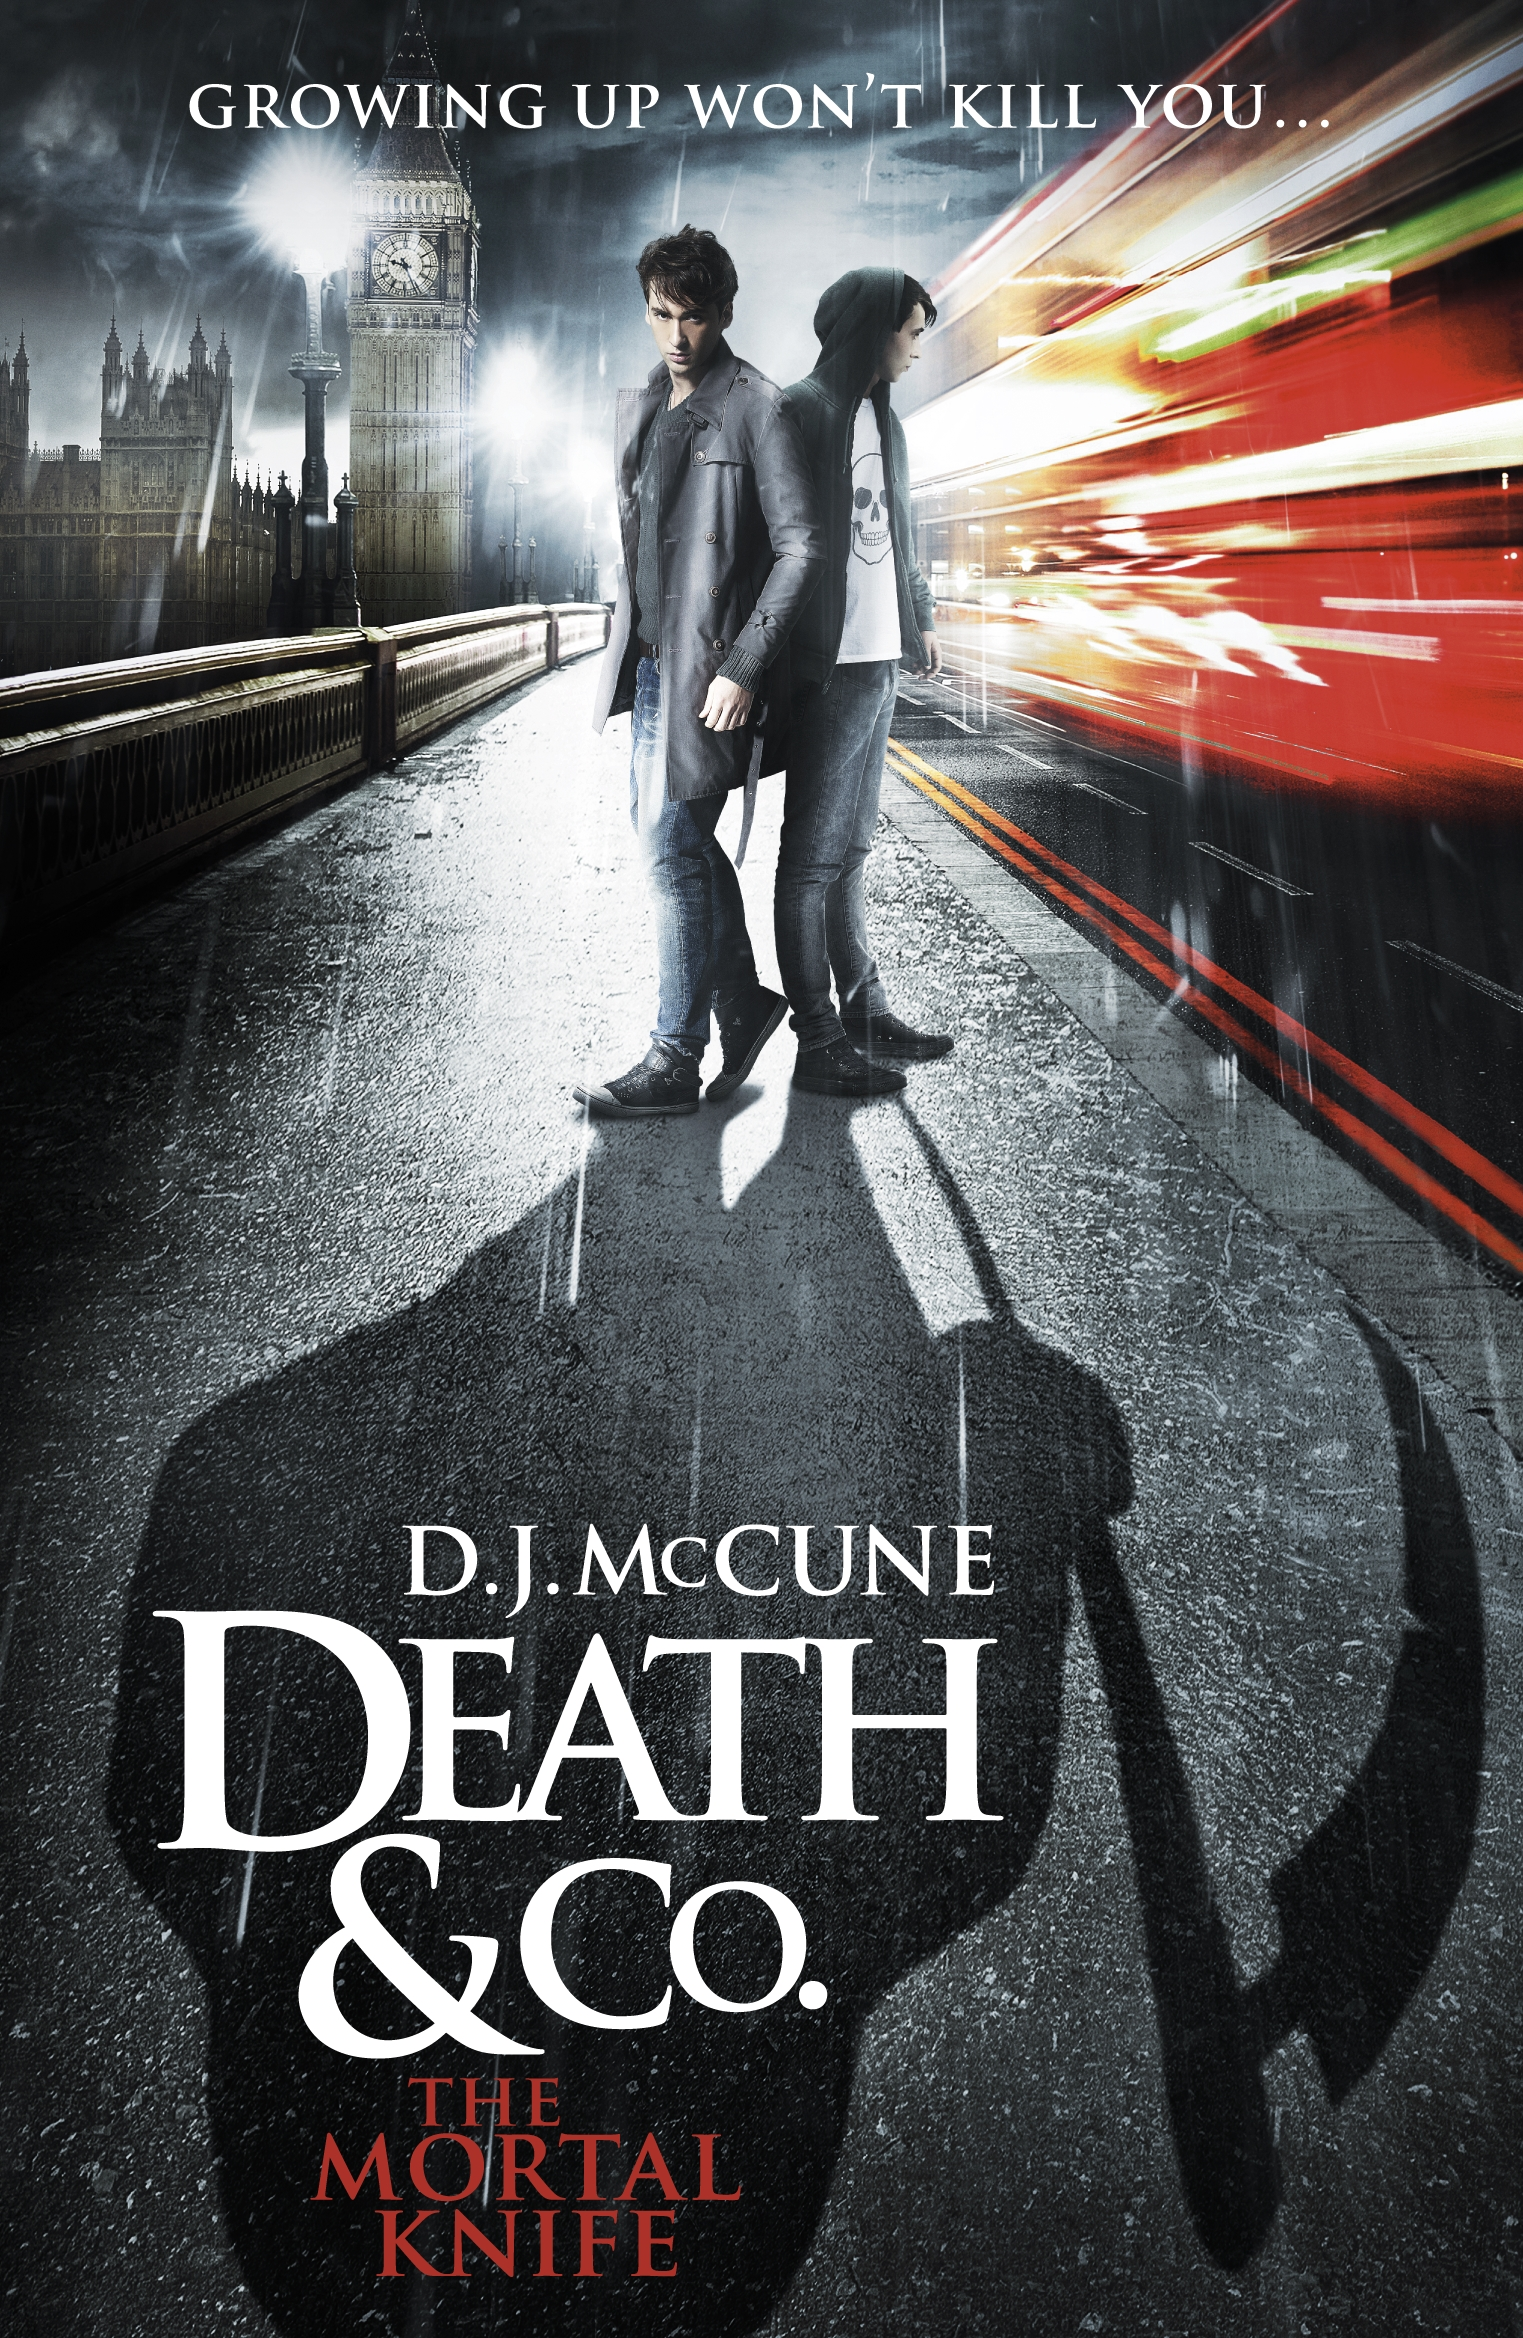 The Mortal Knife by D. J. McCune